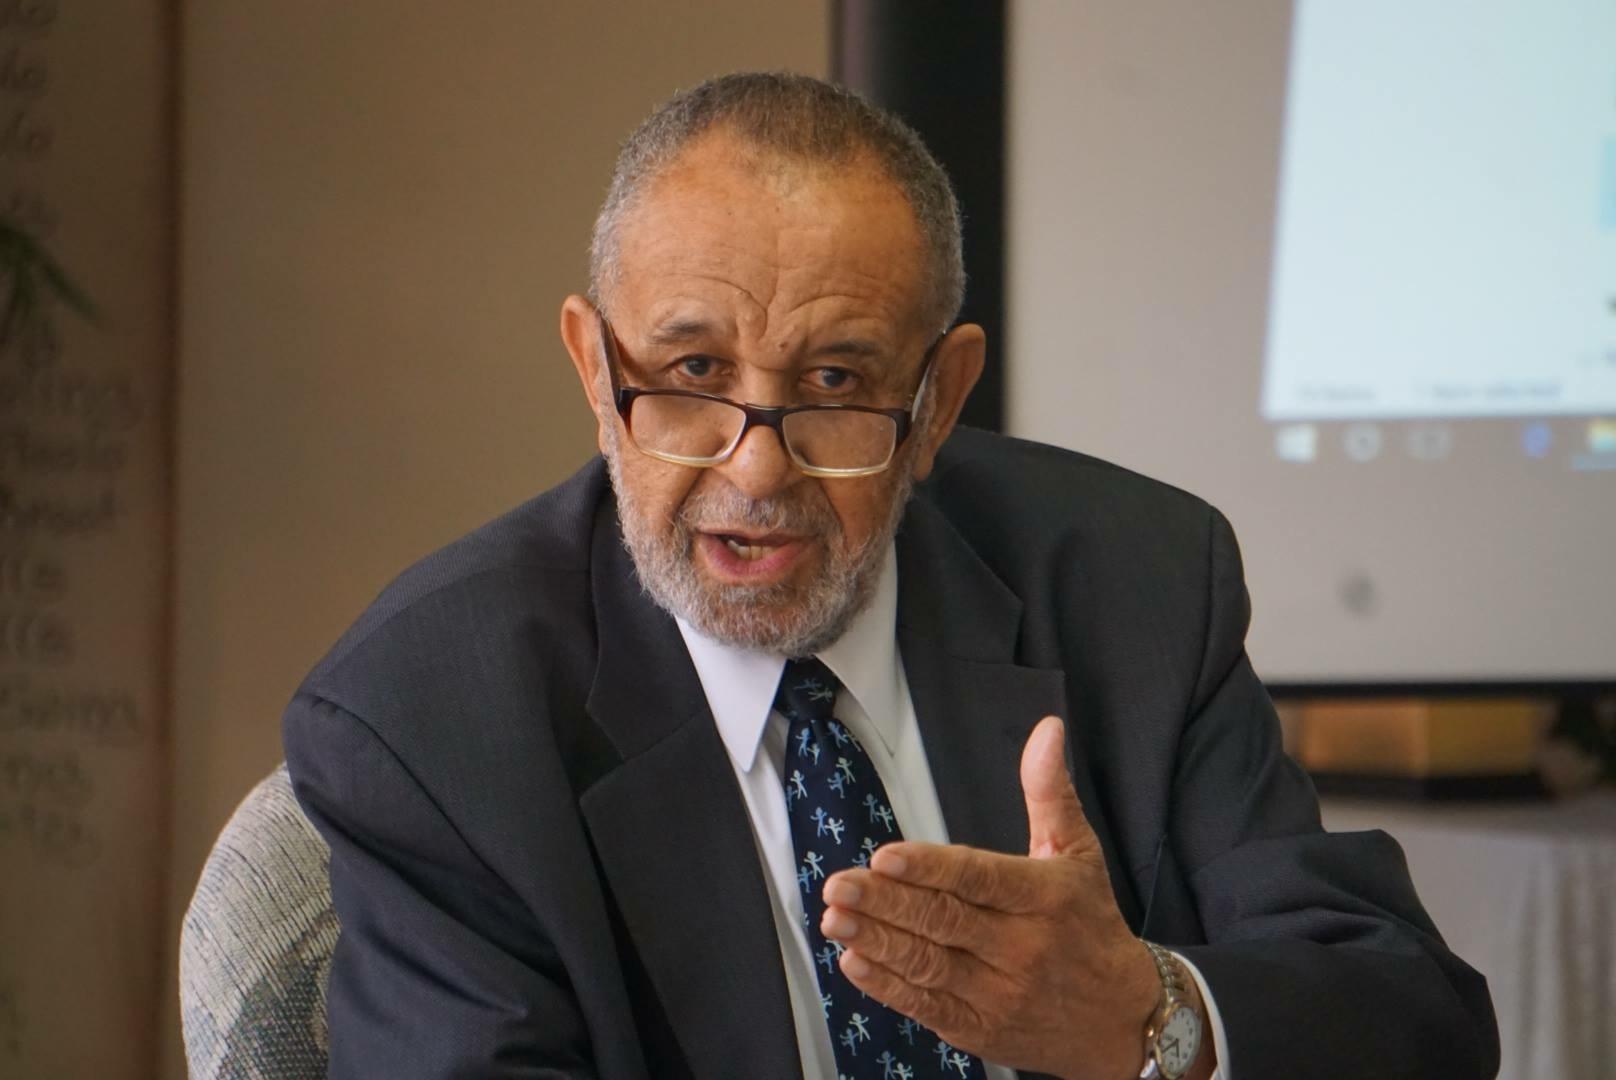 The Rev. Gil Caldwell